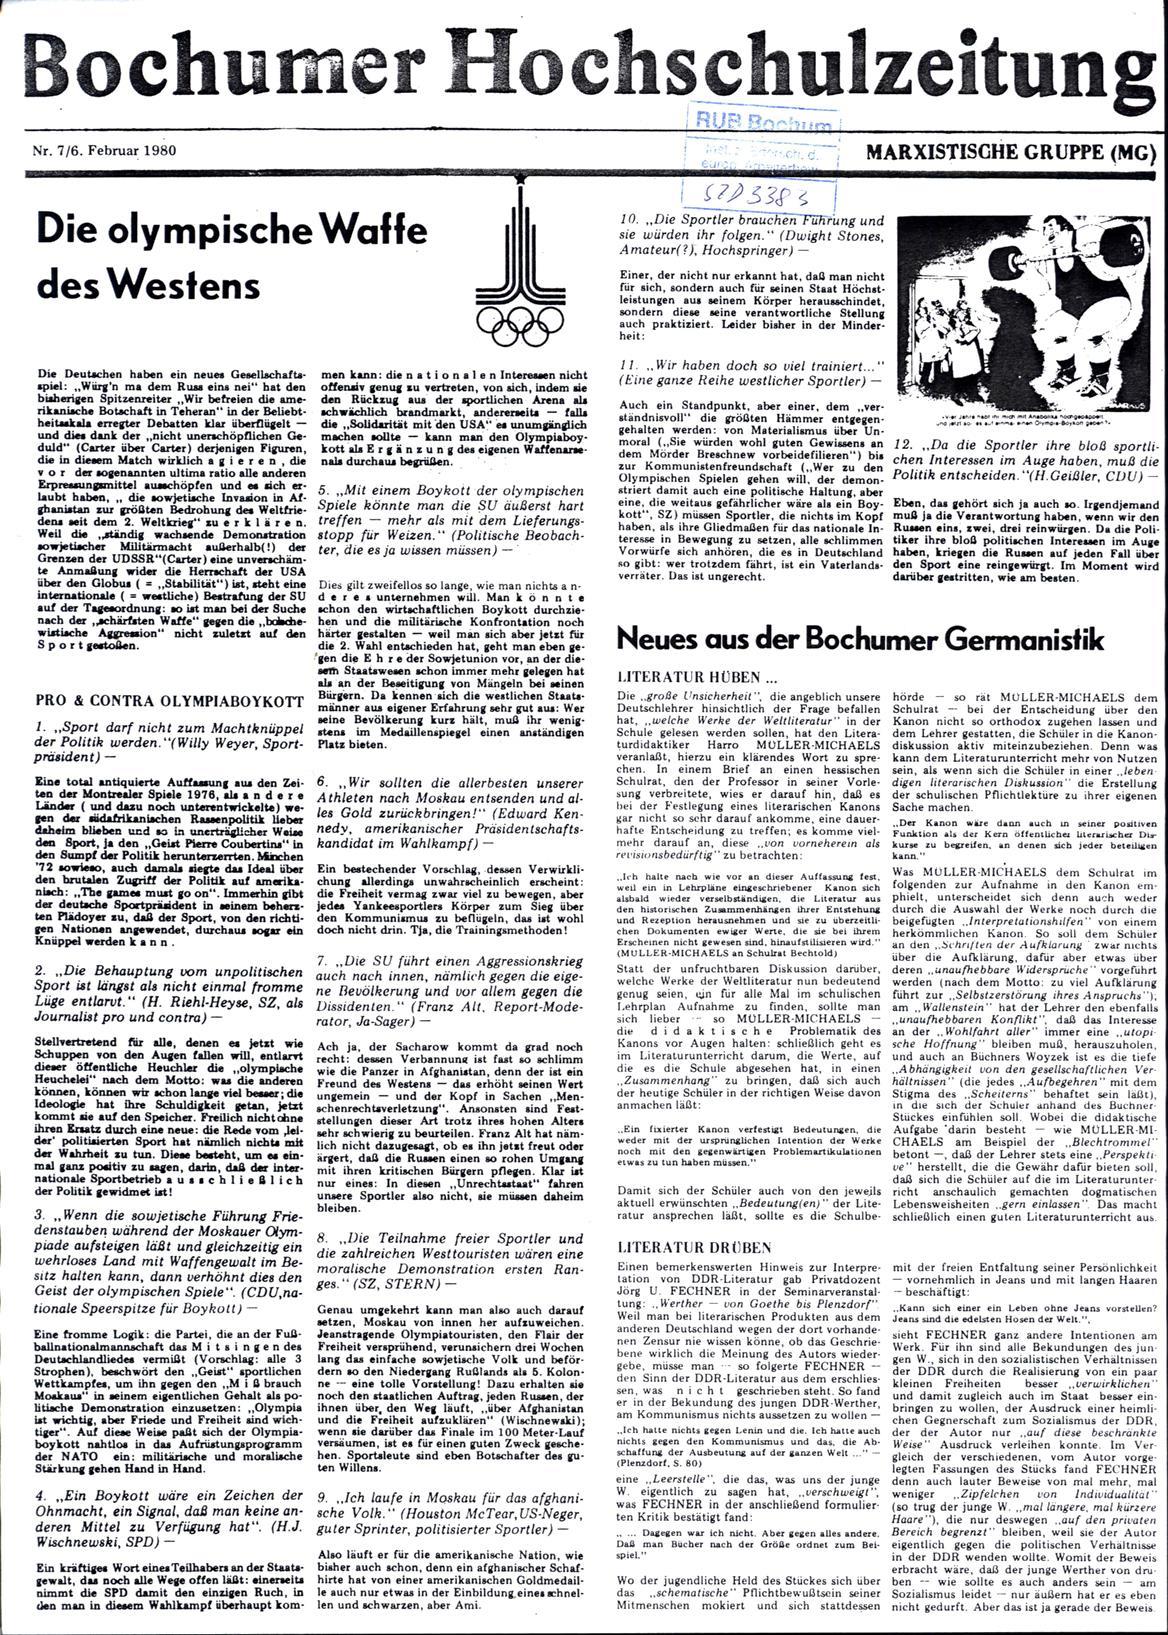 Bochum_BHZ_19800206_007_001